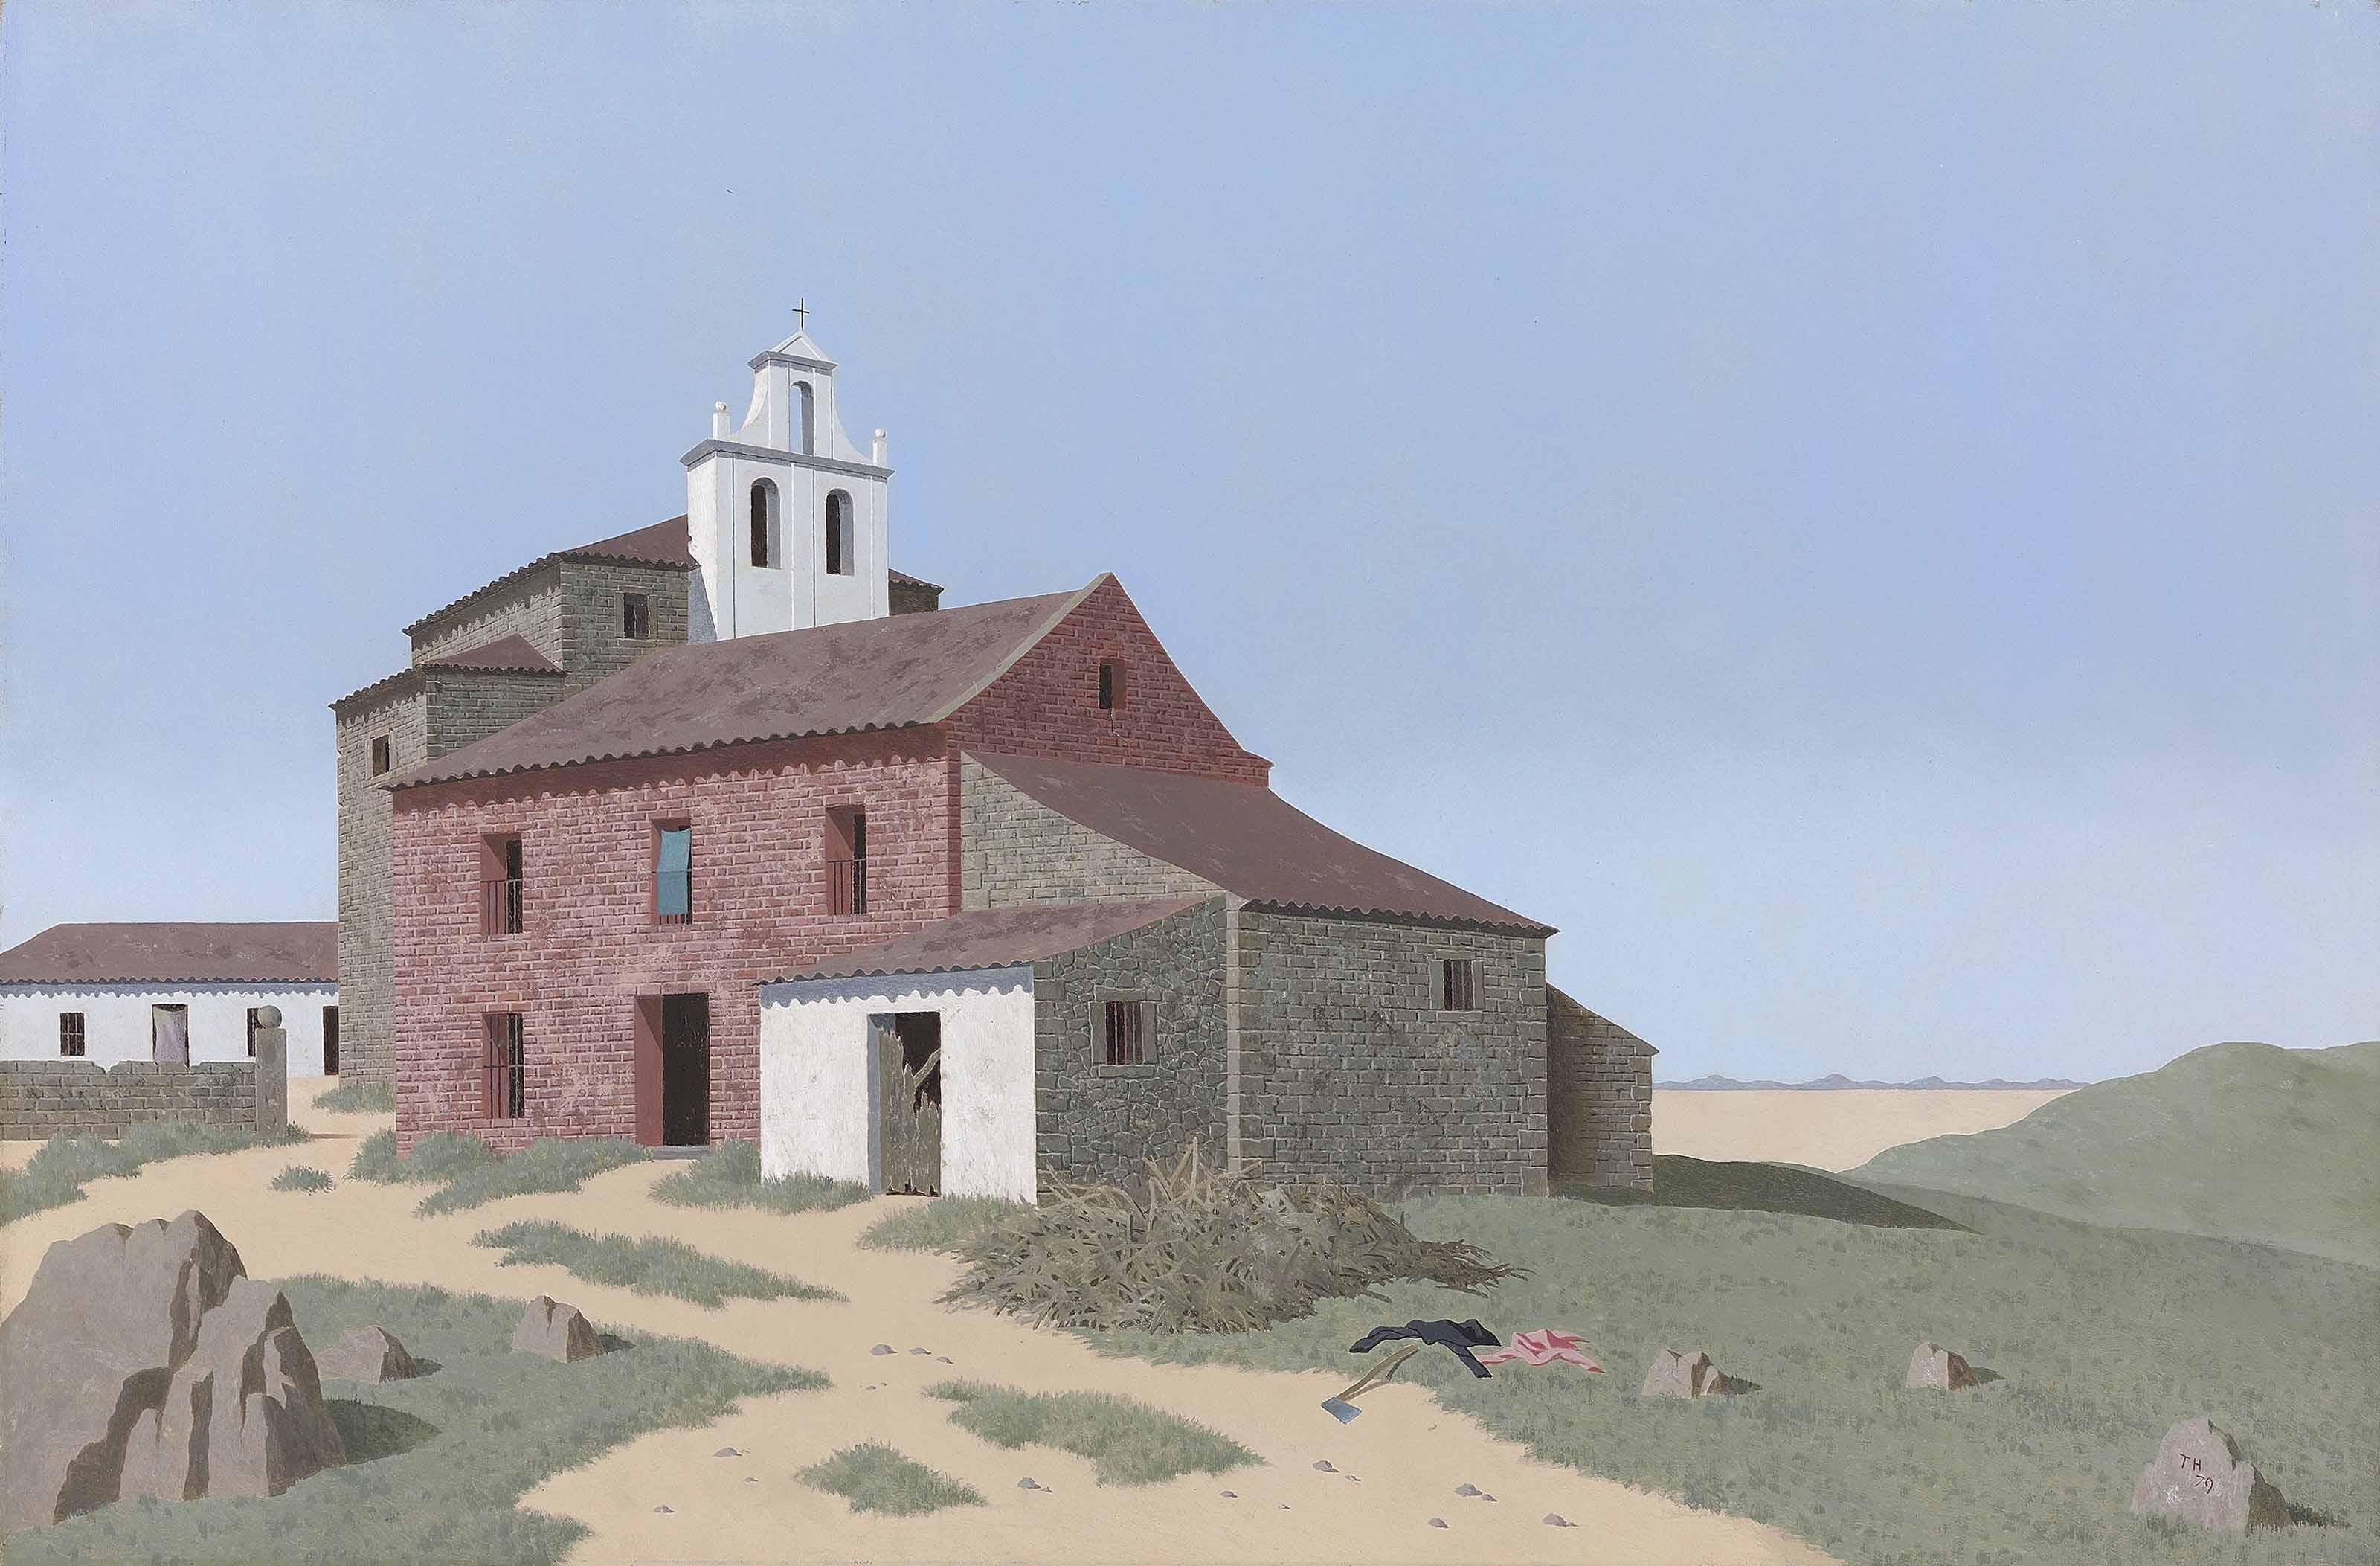 Castilian Farm